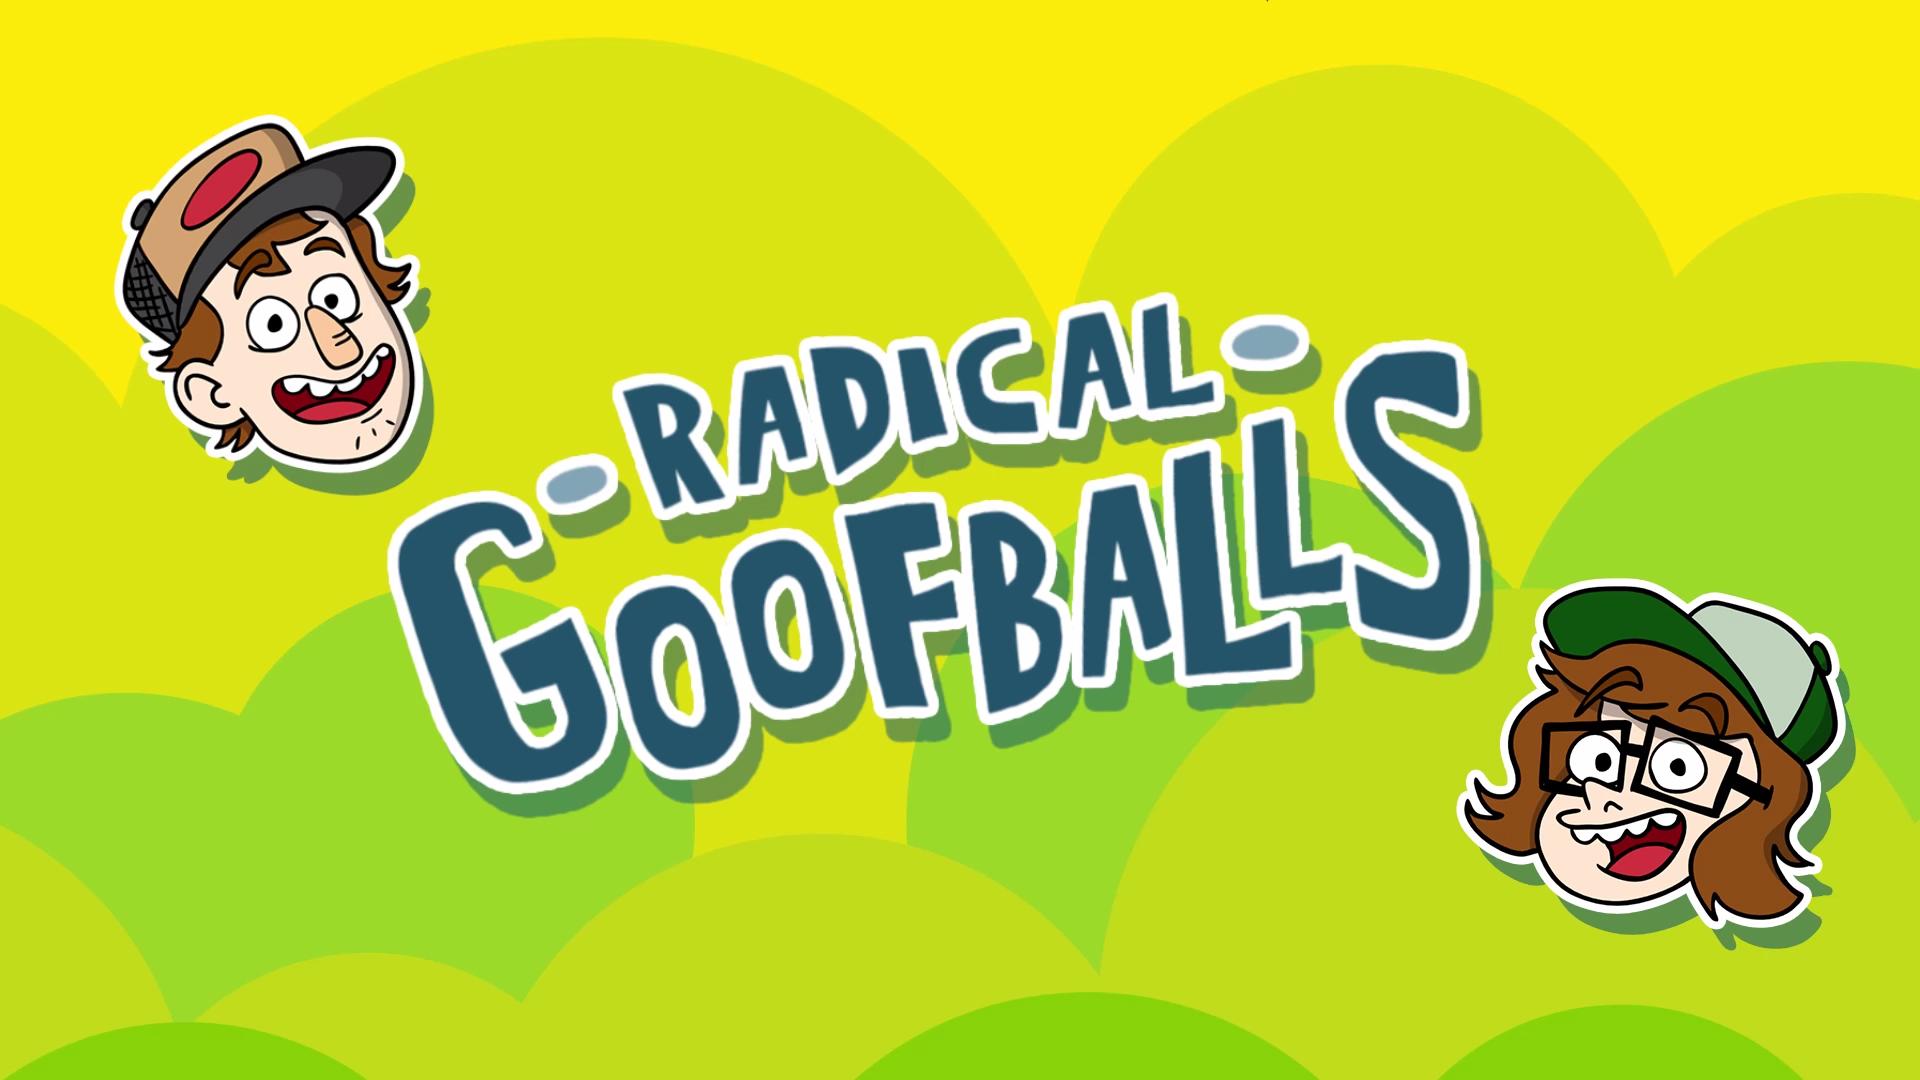 Radical Goofballs